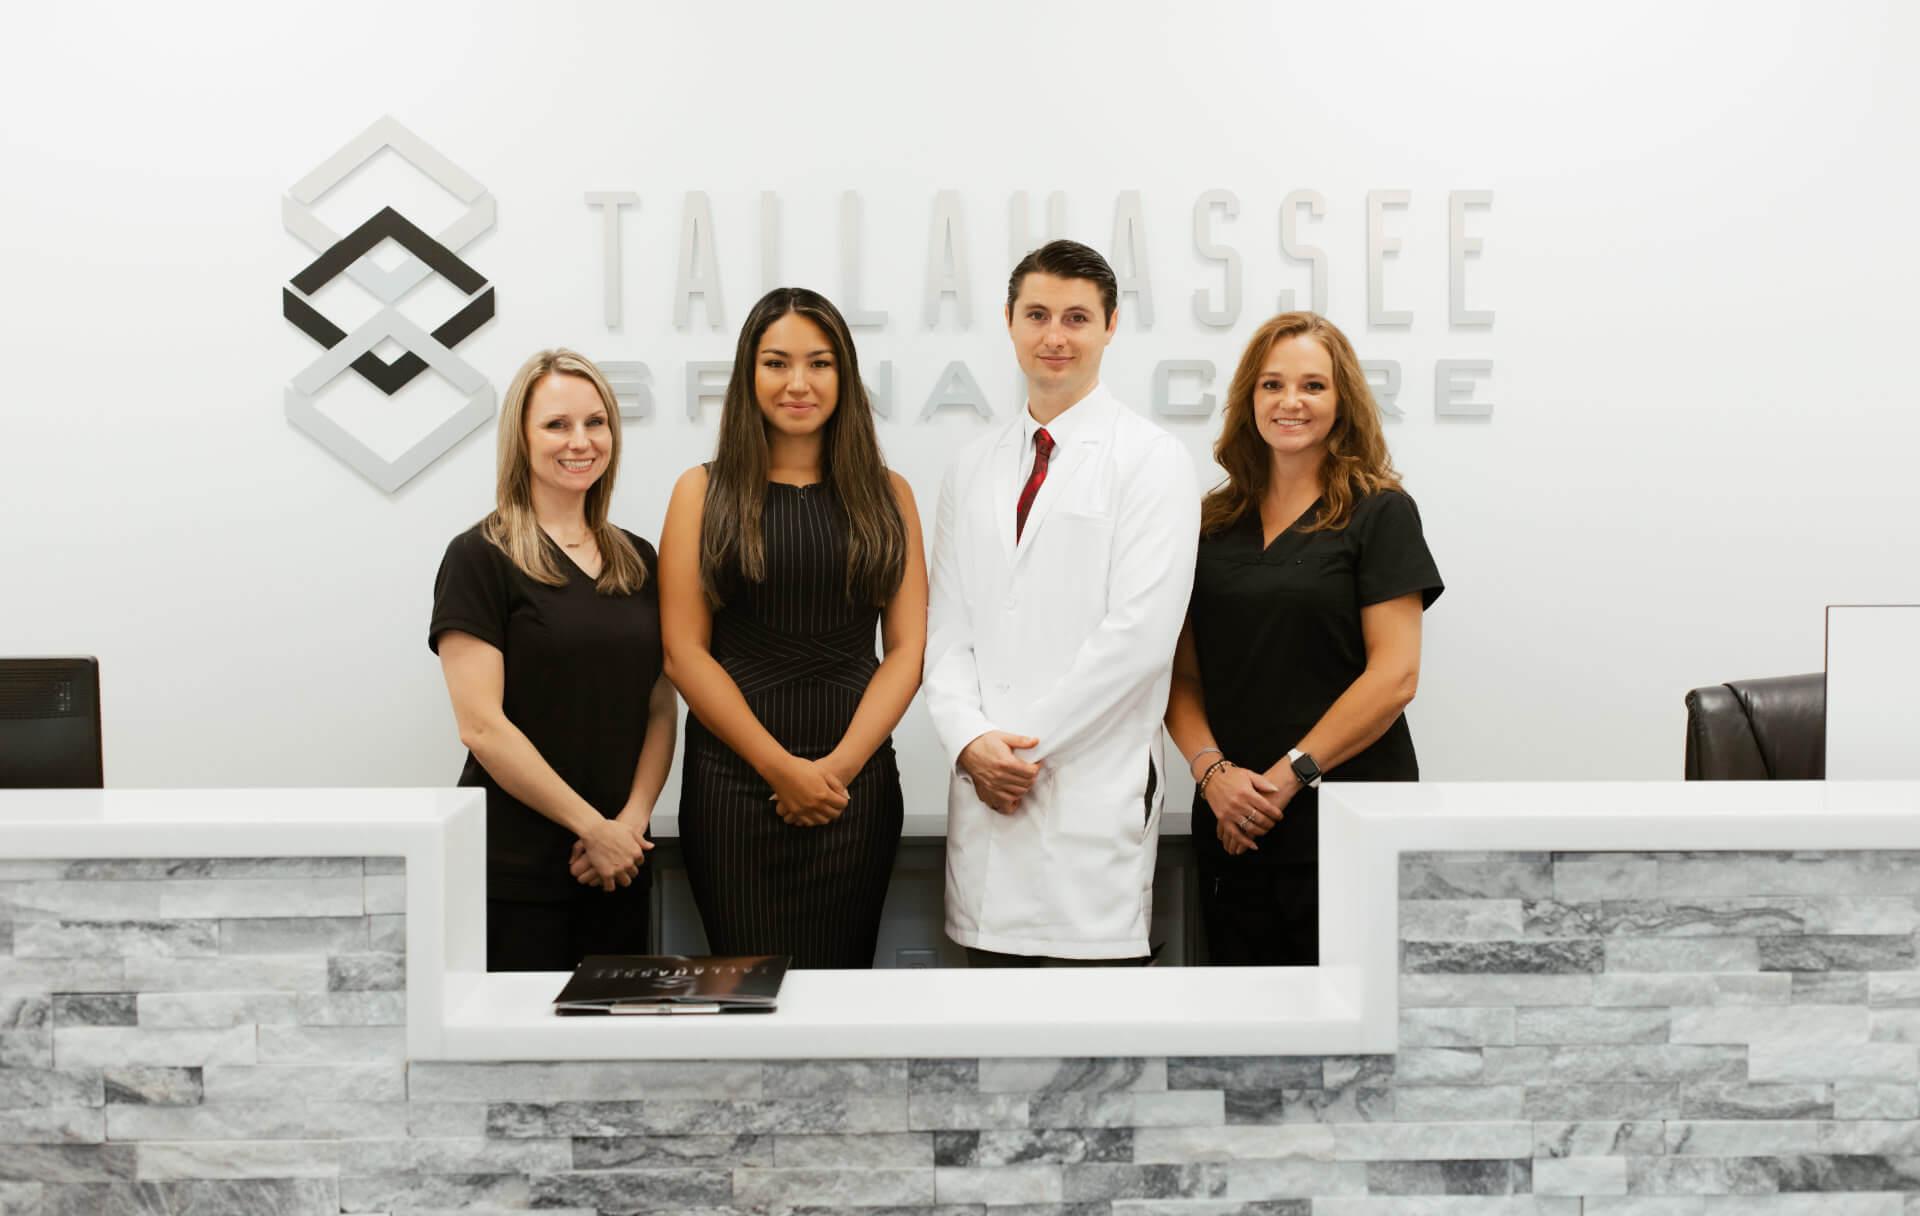 Tallahassee Spinalcare -bg-6